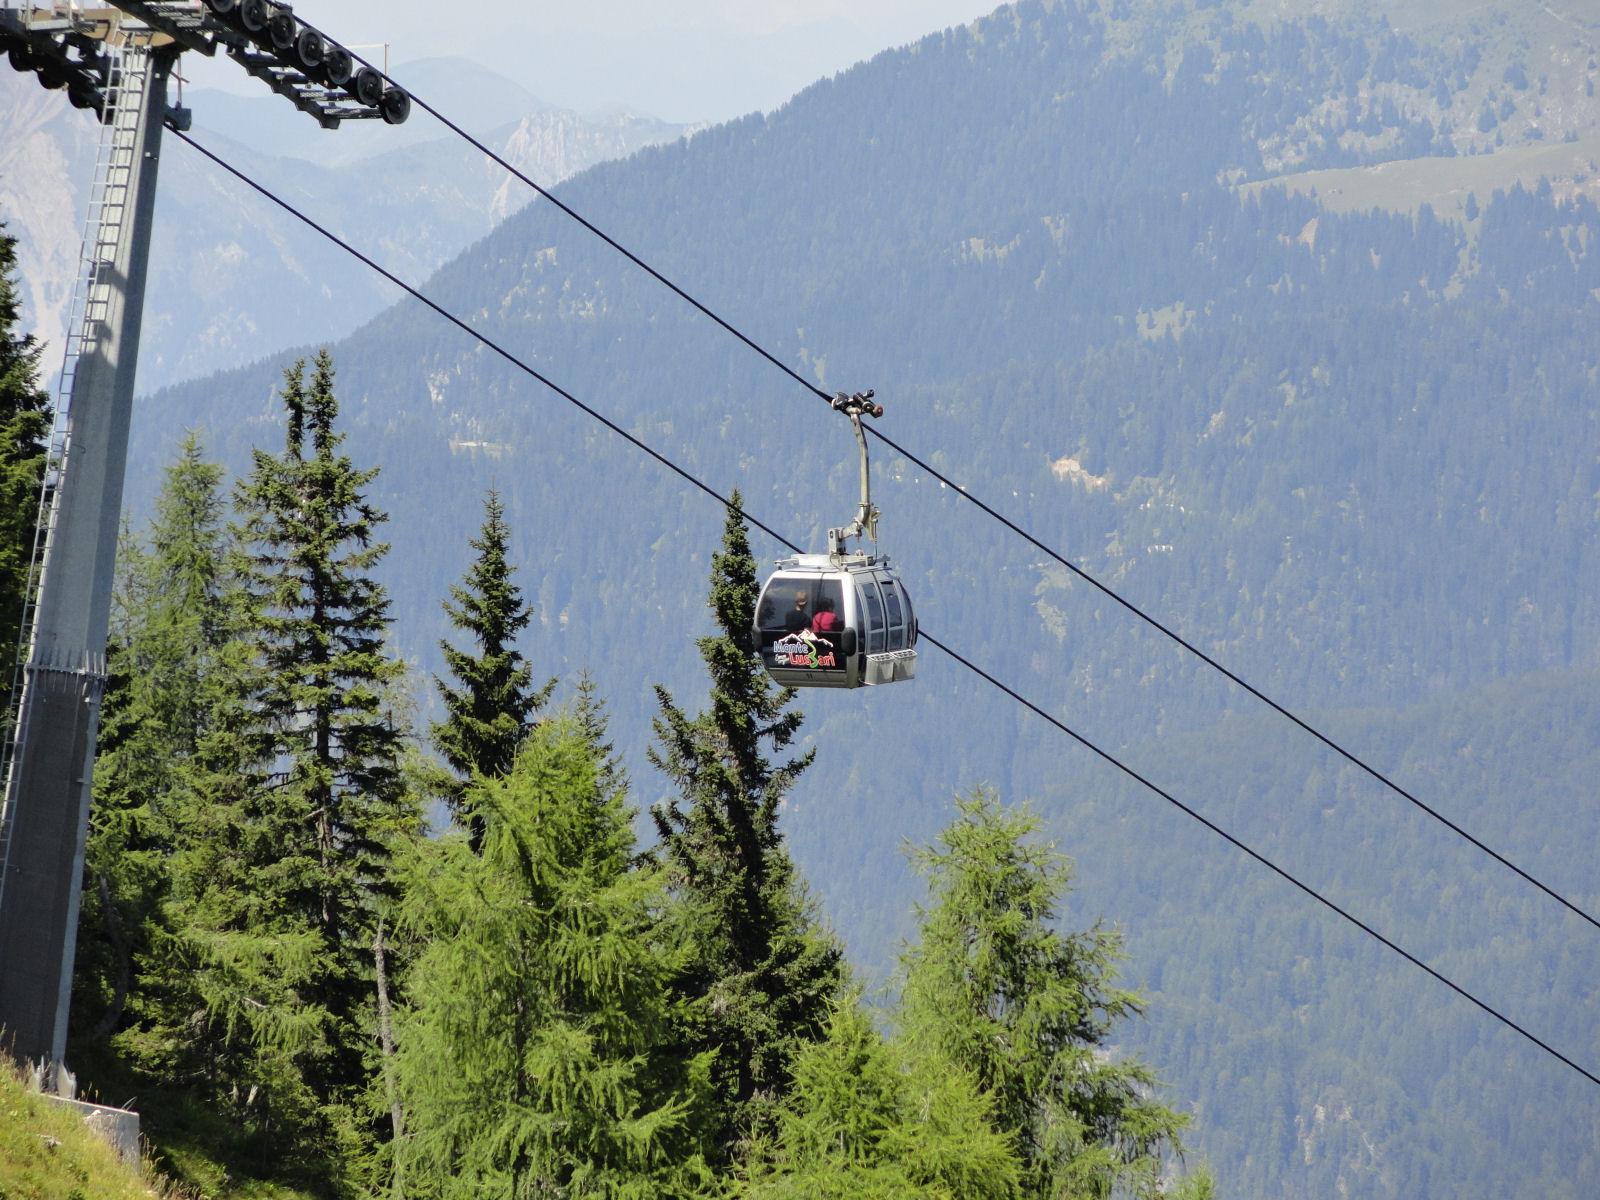 Mount Lussari cable car, Tarvisio, province of Udine, region Friuli-Venezia Giulia, Italy